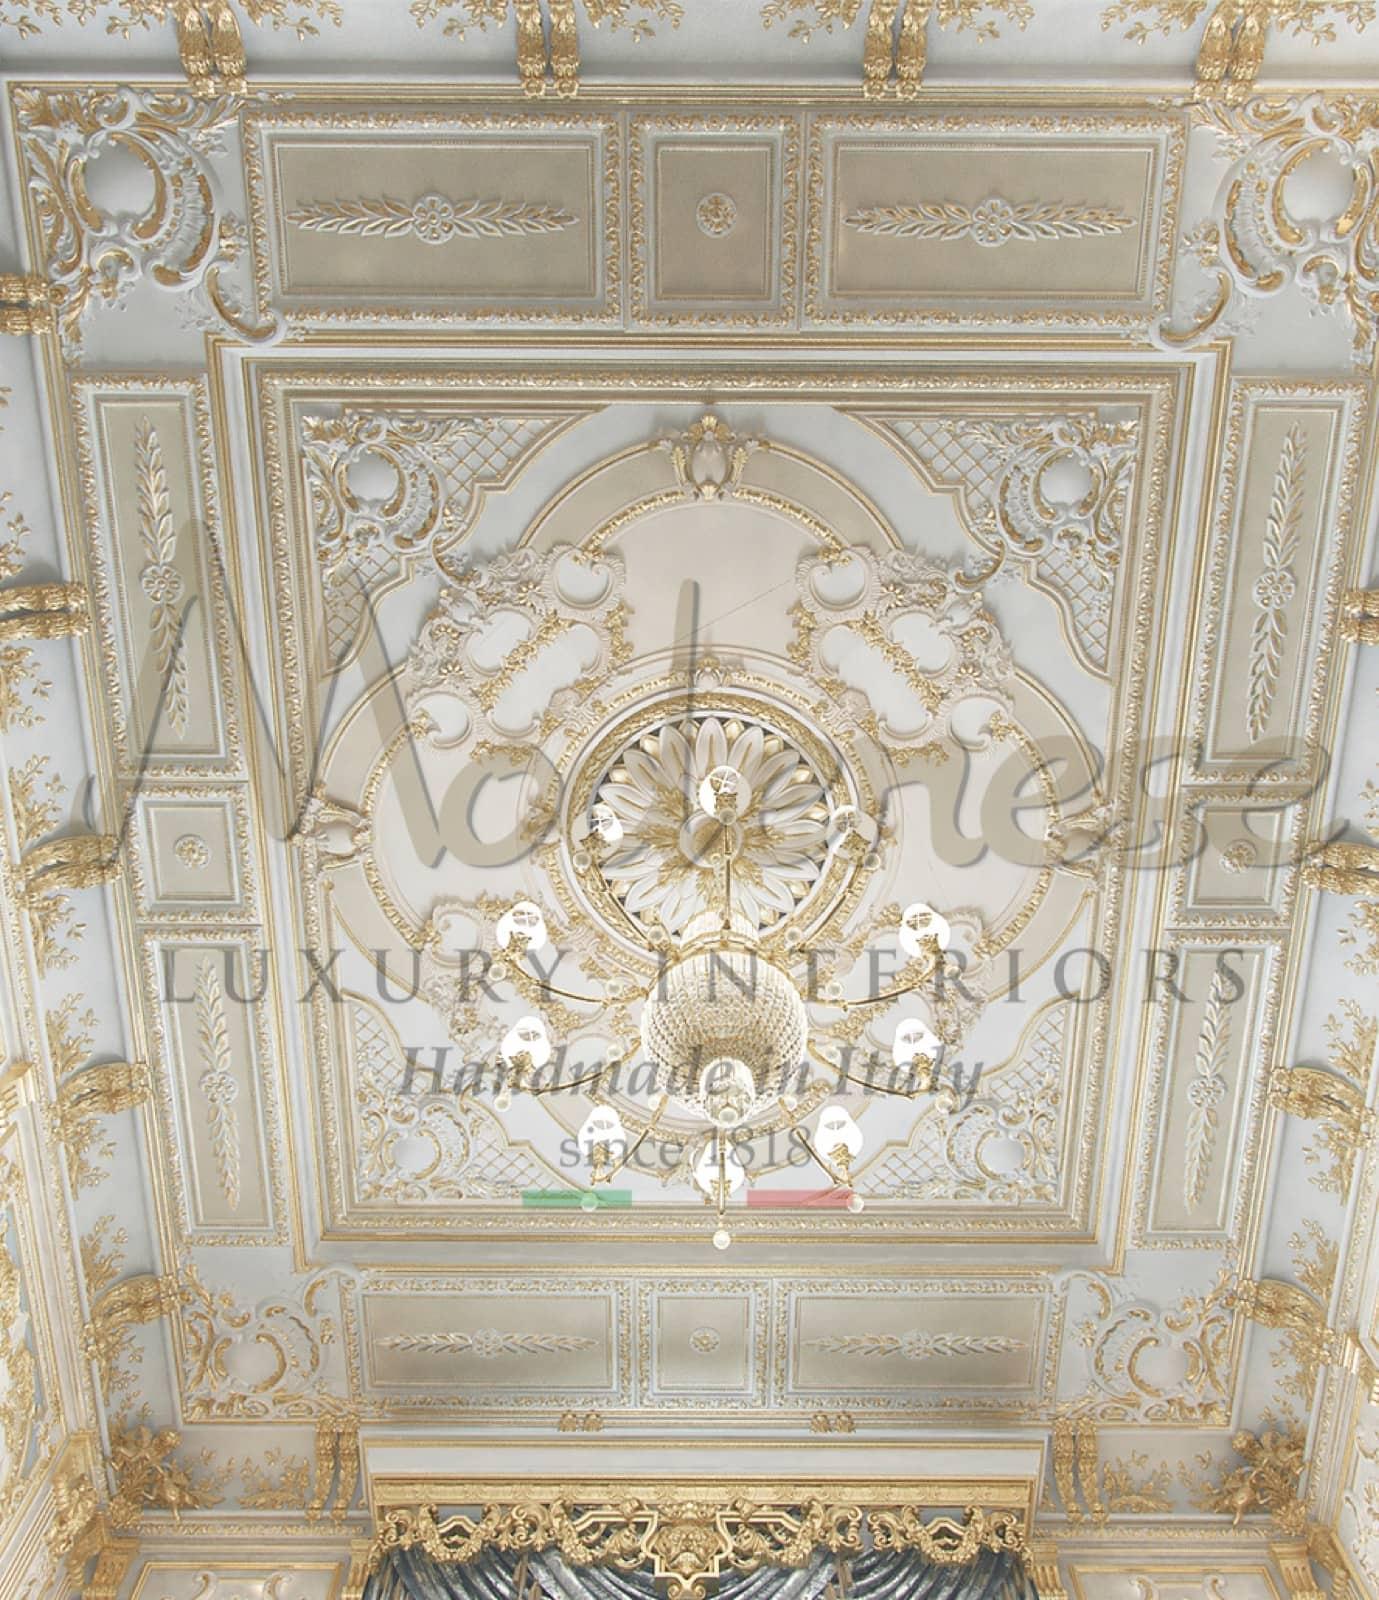 carved wood ceiling gold details gold leaf application handmade baroque classic interior design ideas elegant style decoration luxury carving boiserie chandelier customized designs custom made taste bespoke villa palace